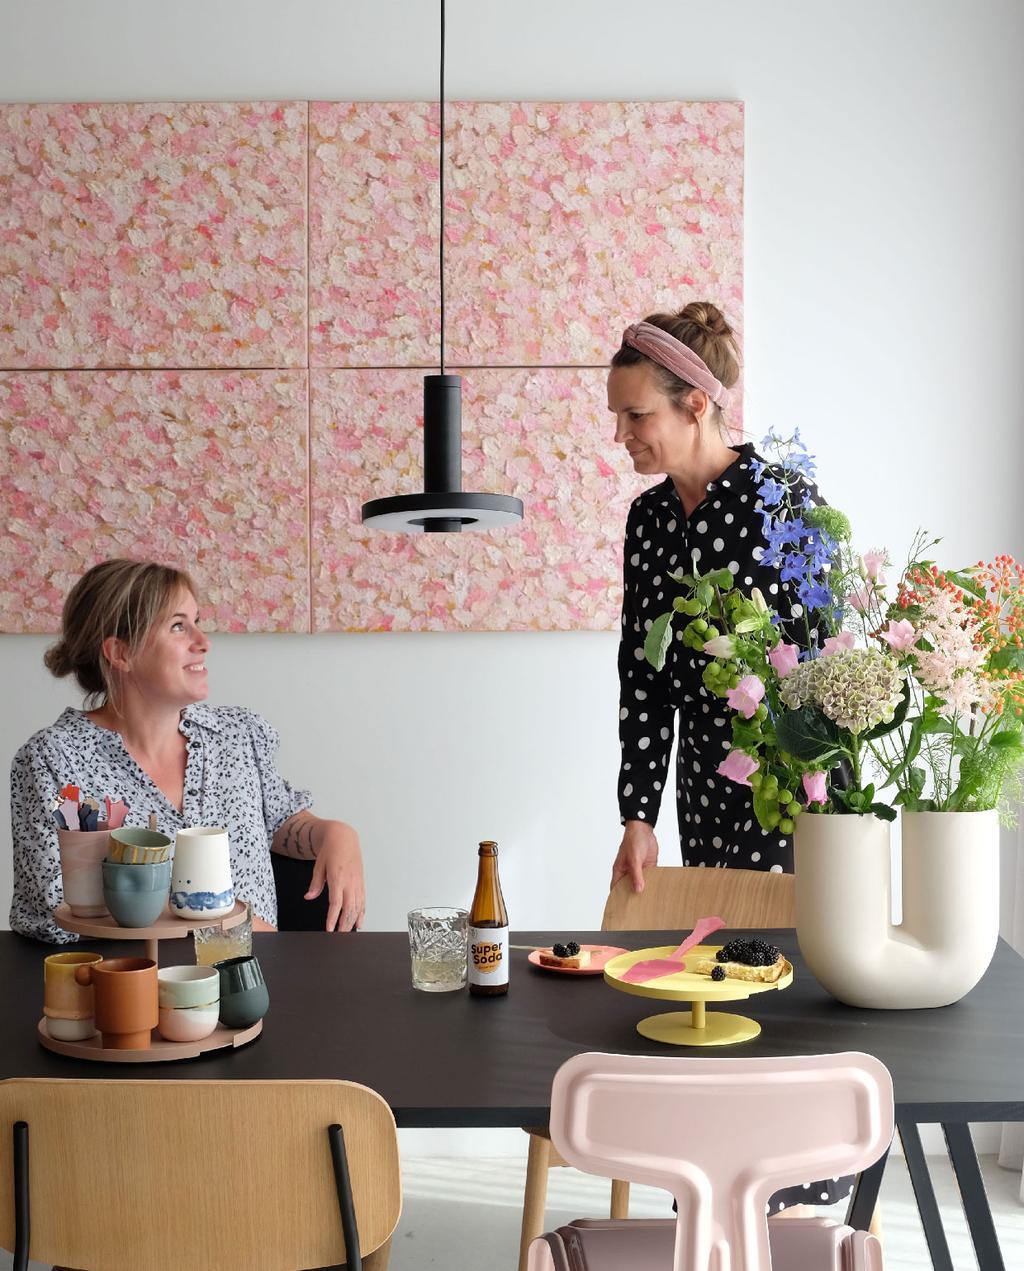 vtwonen blog prchtg | waarom prchtg een goed team is roze kunst witte bollige vaas jessica en fleur